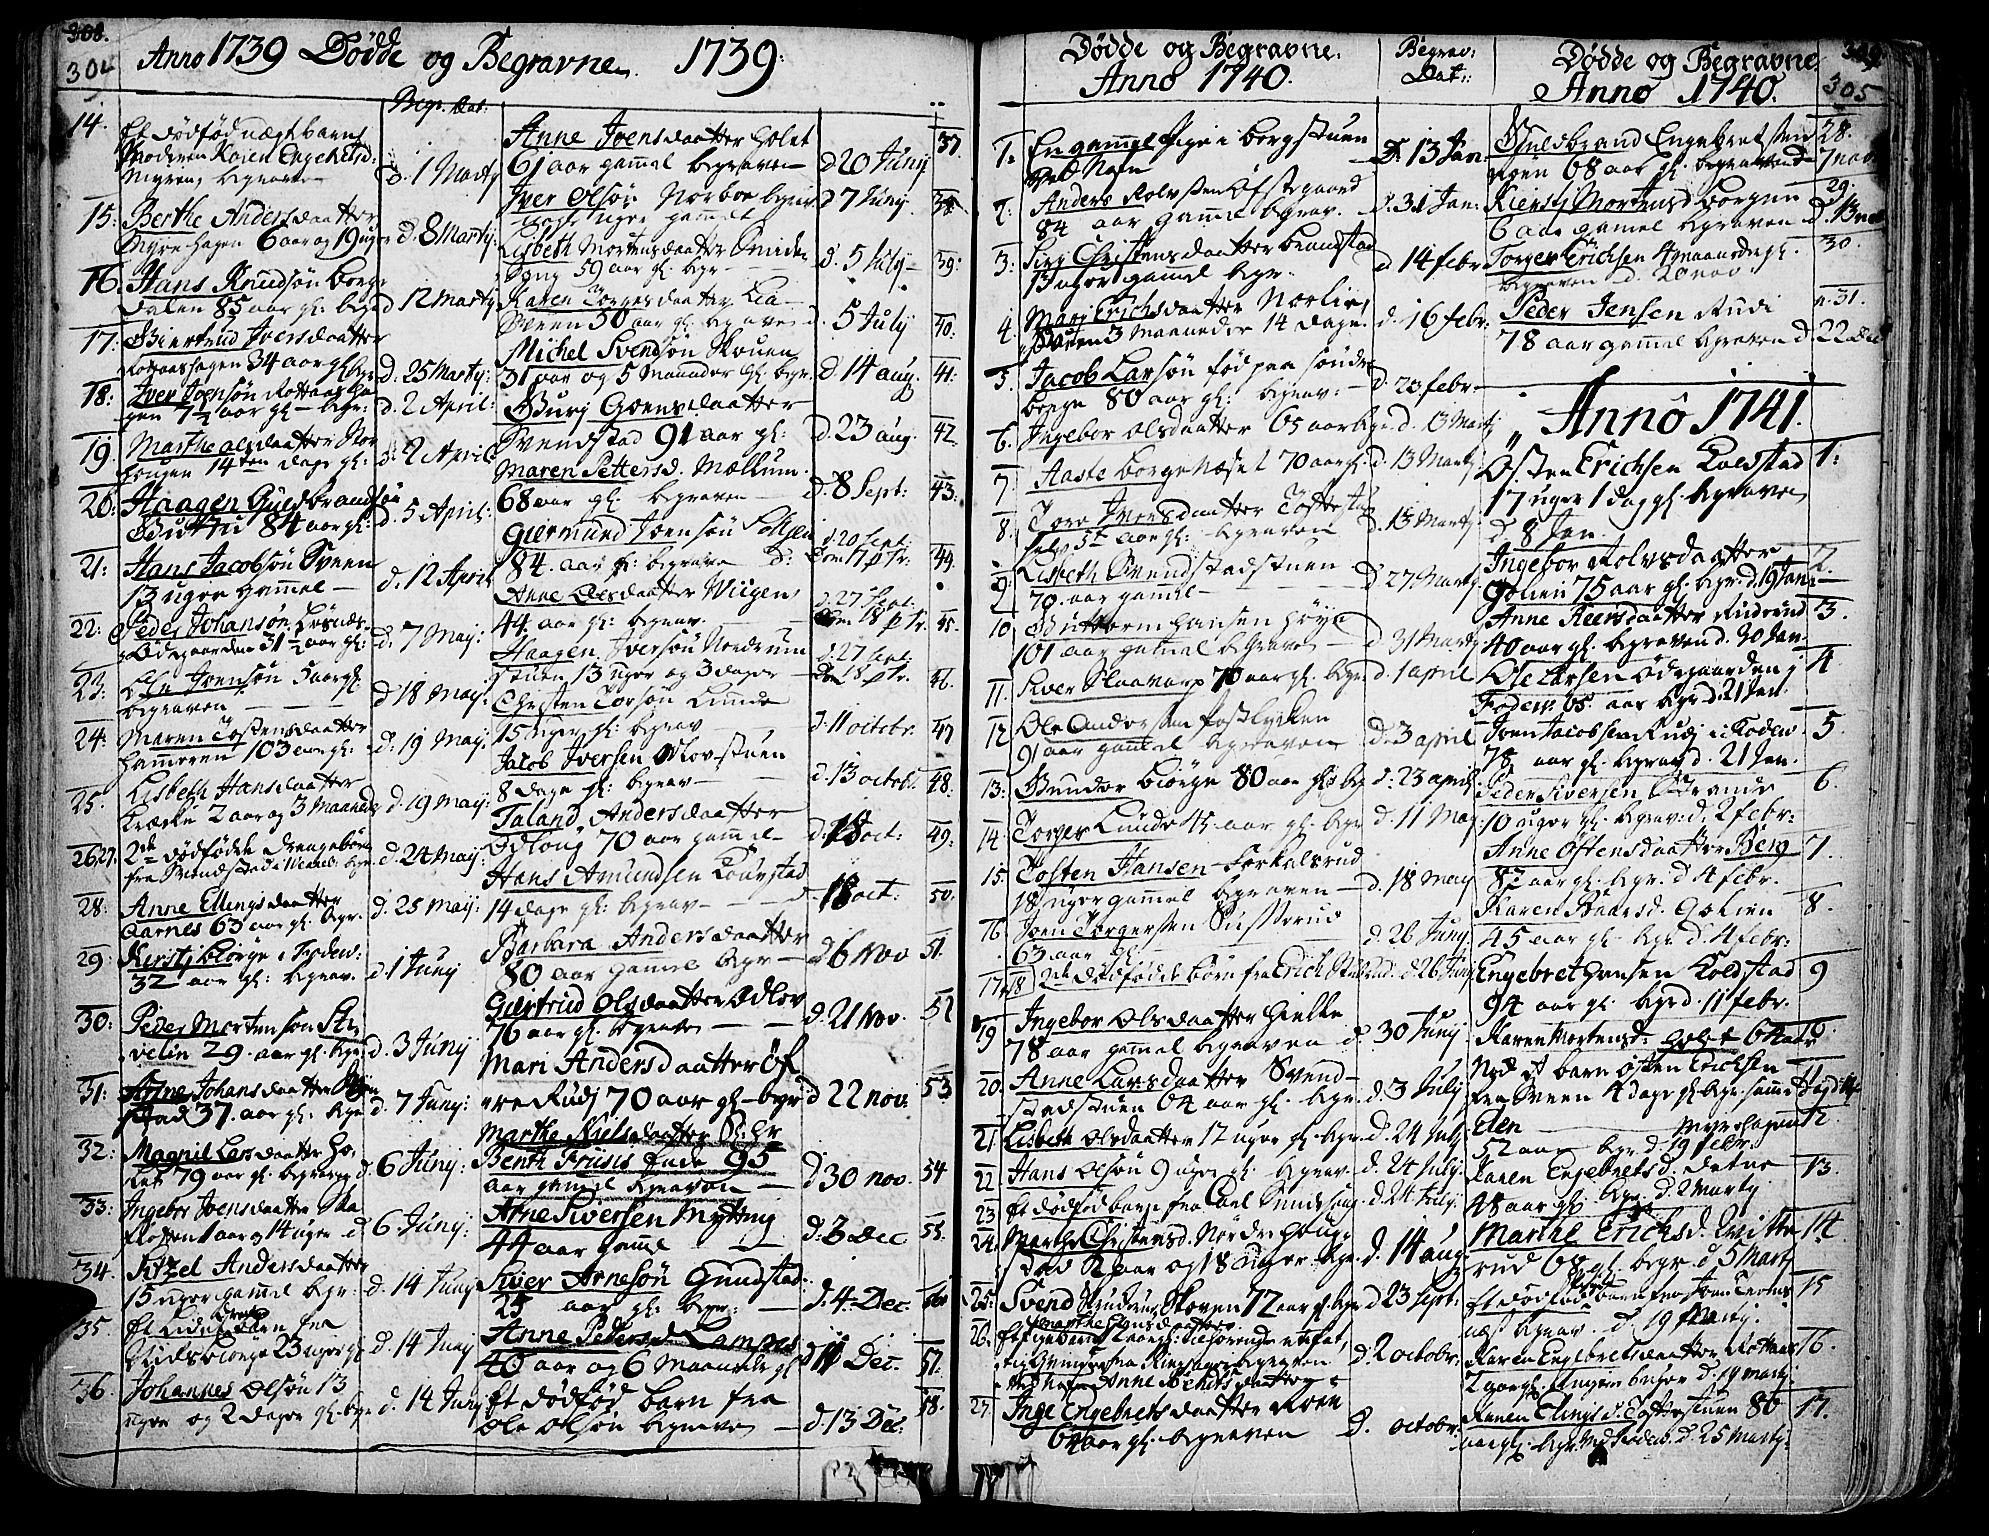 SAH, Ringebu prestekontor, Ministerialbok nr. 2, 1734-1780, s. 304-305